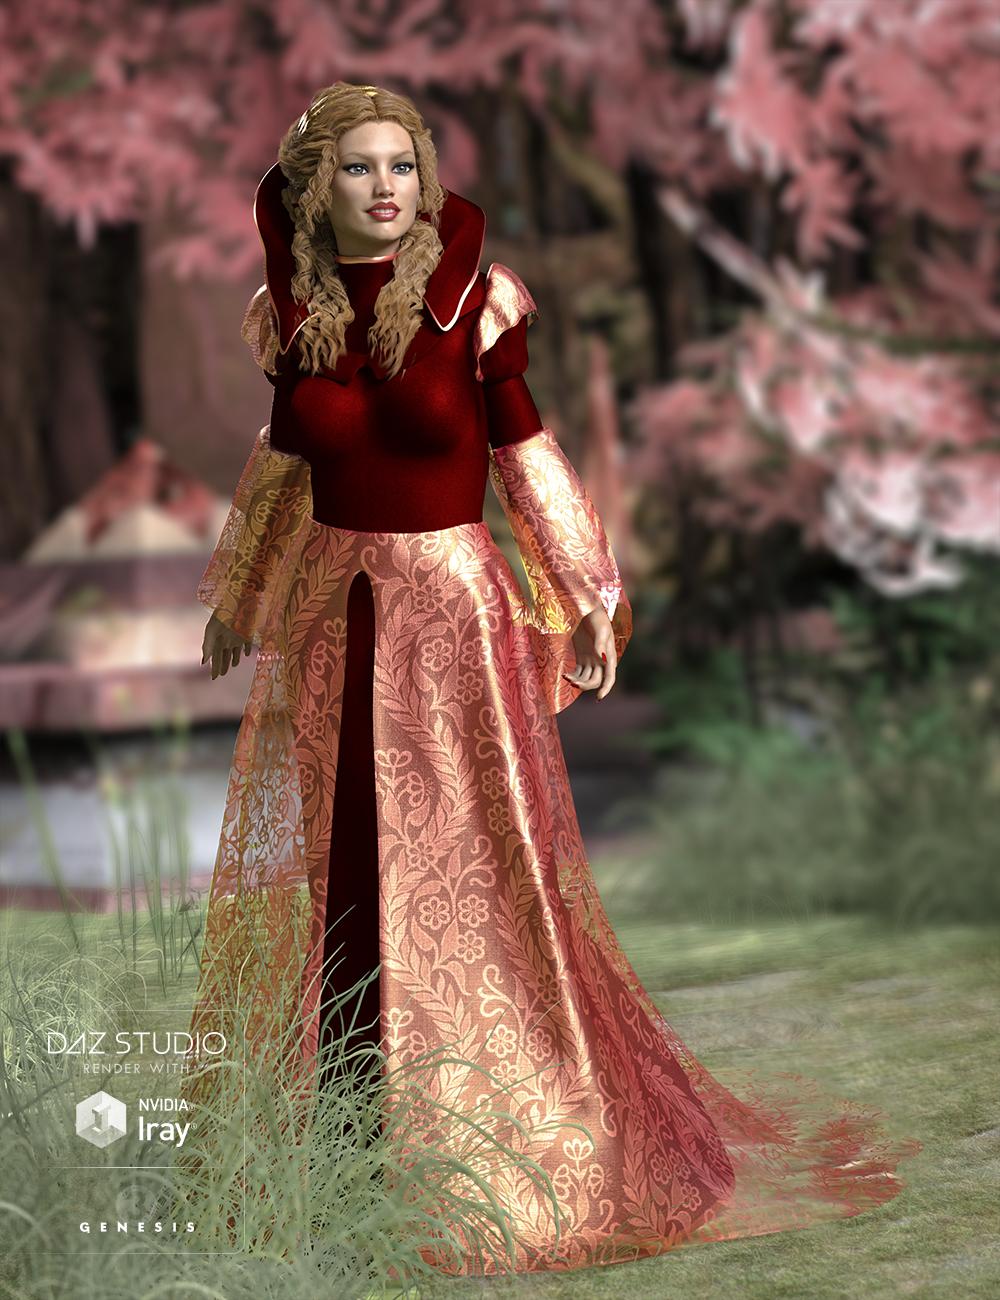 MFD Expansion Pack 1 for Genesis 3 Female(s) by: JGreenleesPoisenedLilyRavenhair, 3D Models by Daz 3D